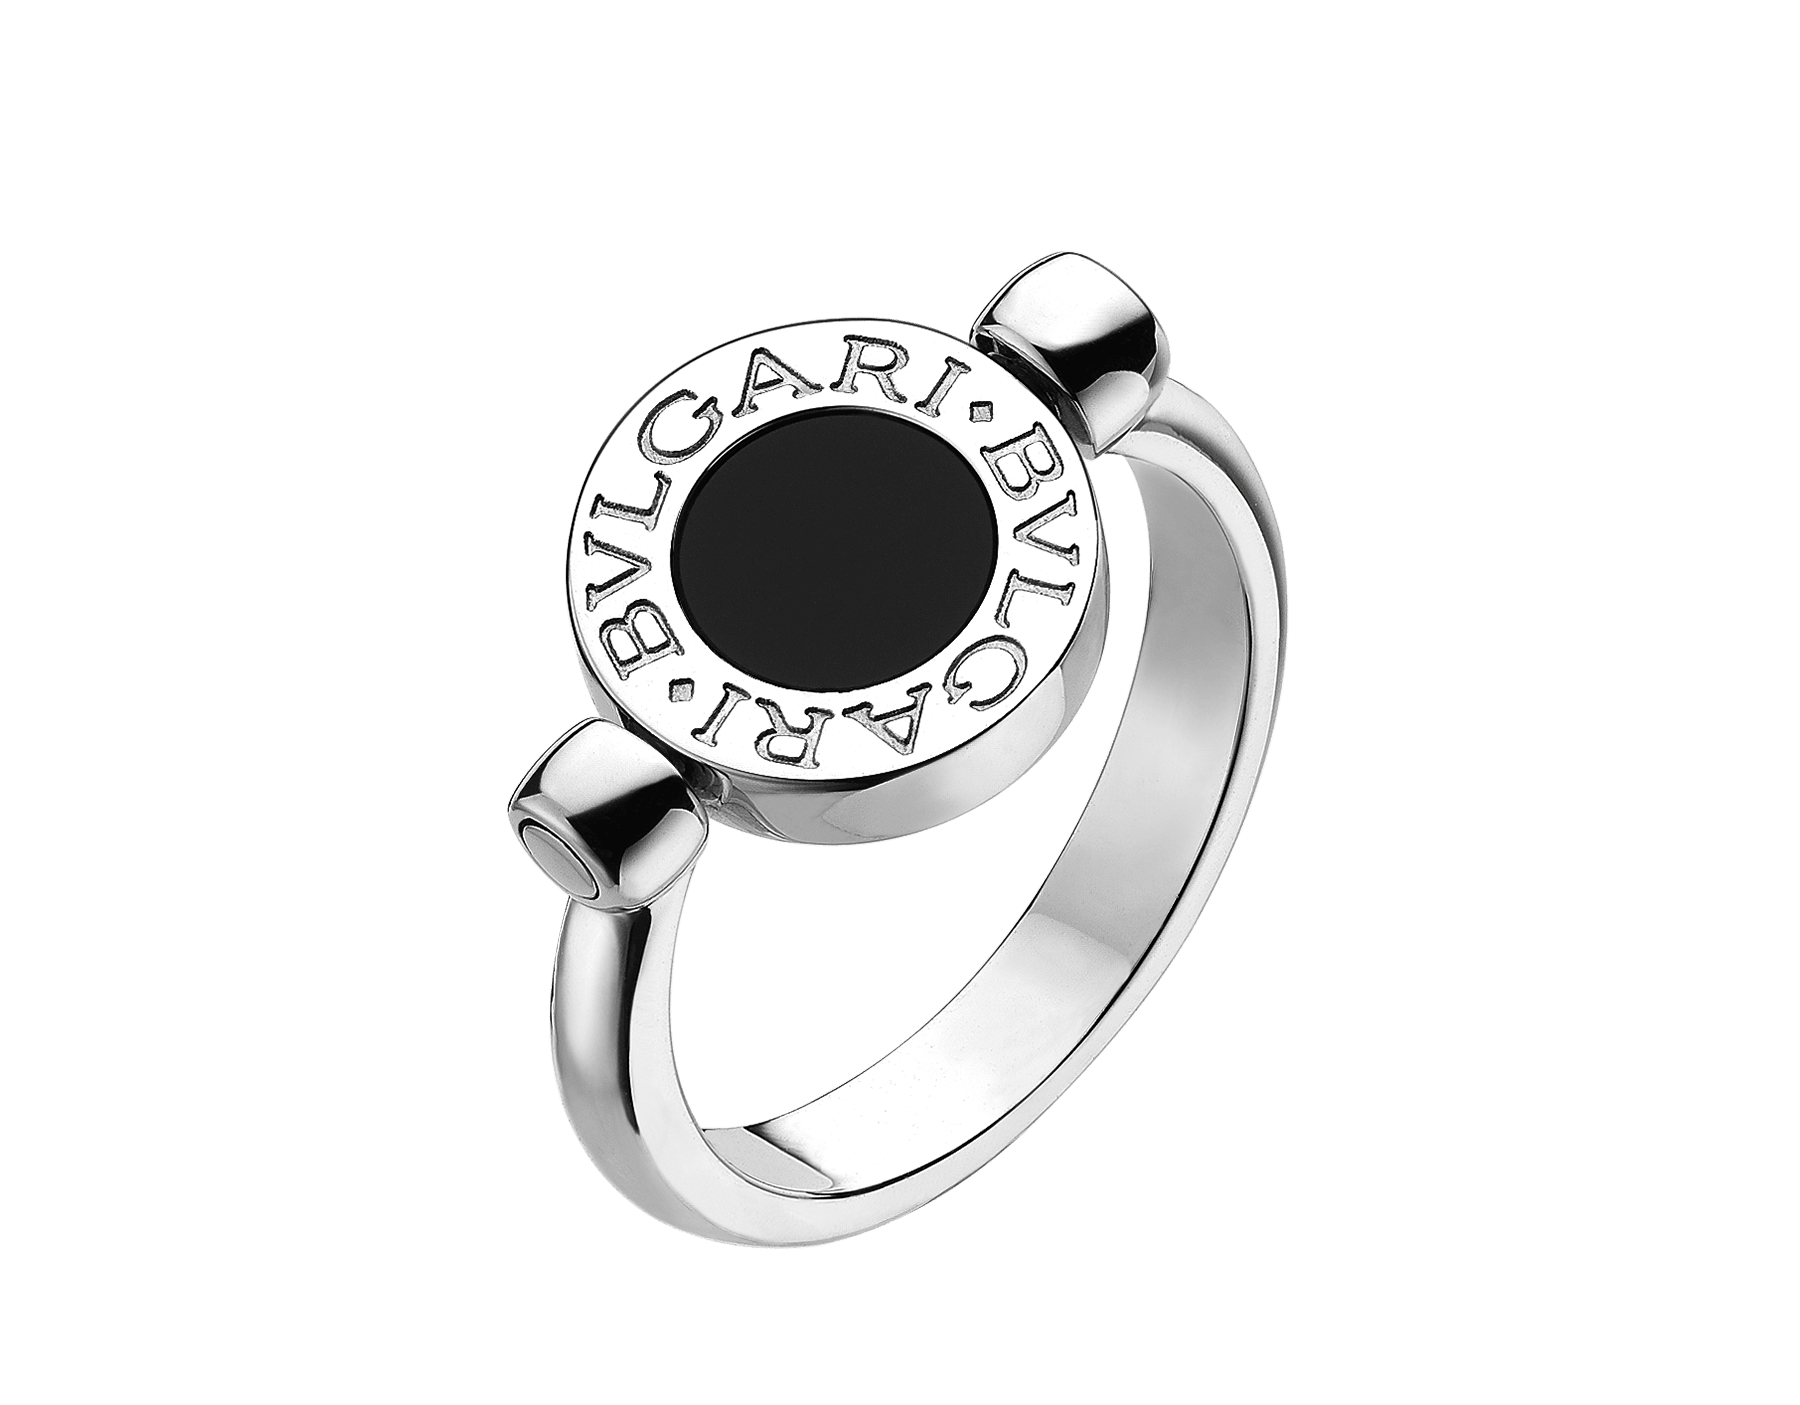 BVLGARI BVLGARI 18 kt white gold flip ring set with black onyx and pavé diamonds AN850723 image 2